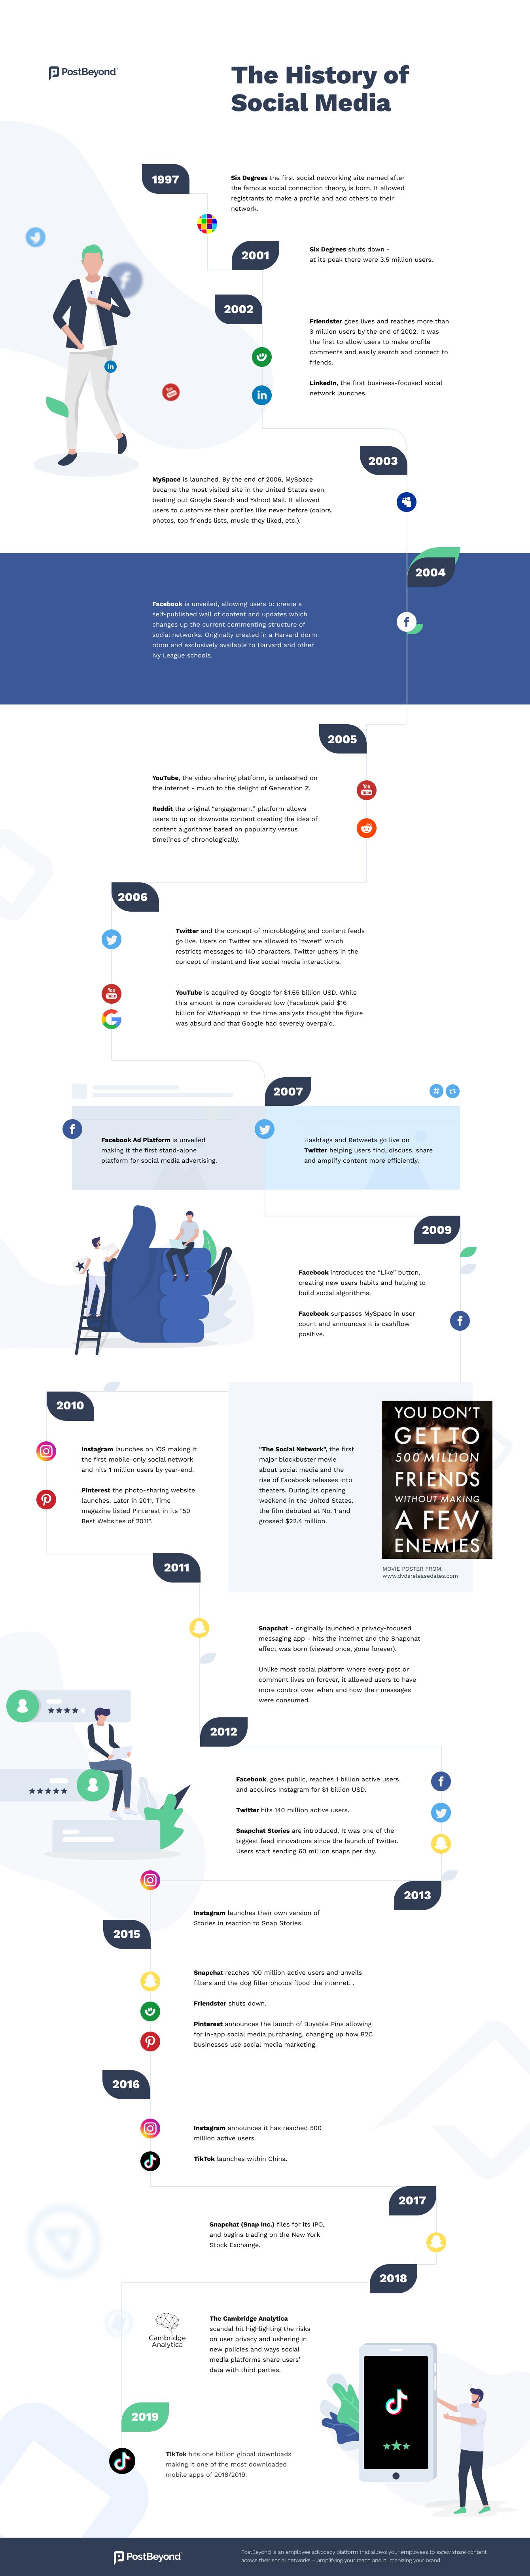 Social media history infographic